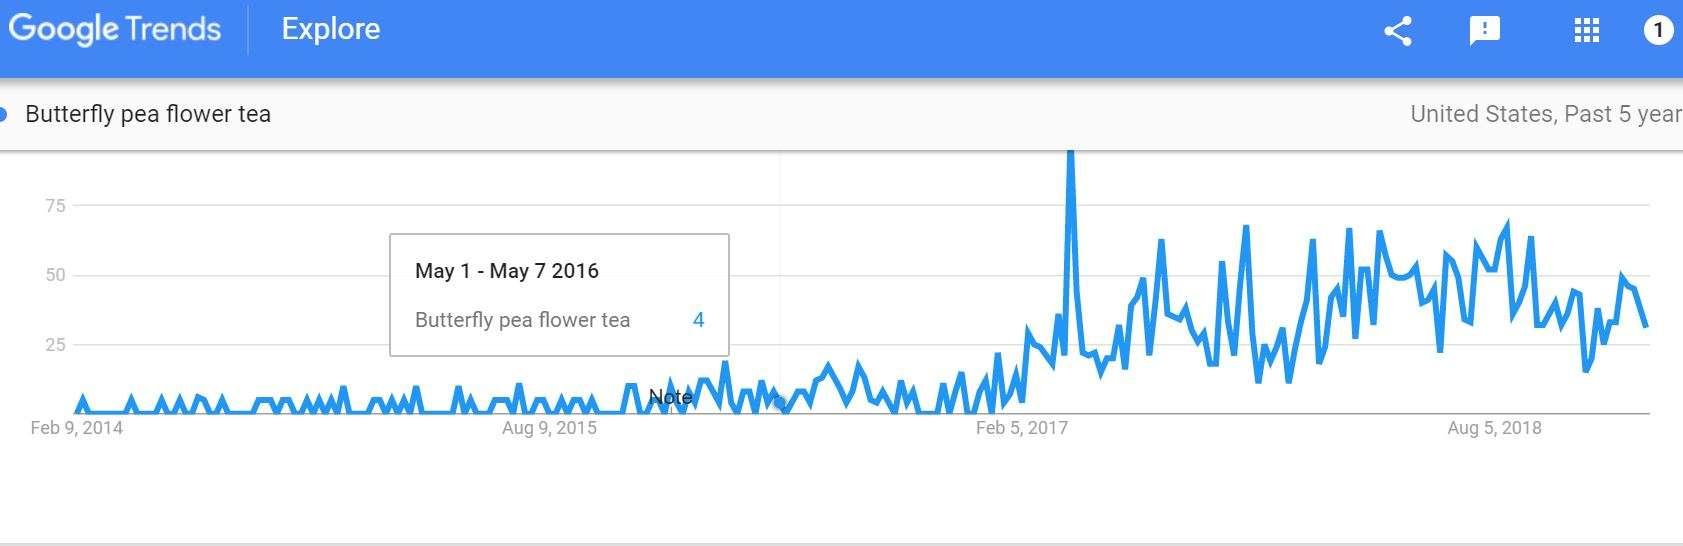 Google Trends Review of Tea Trends – Part 2